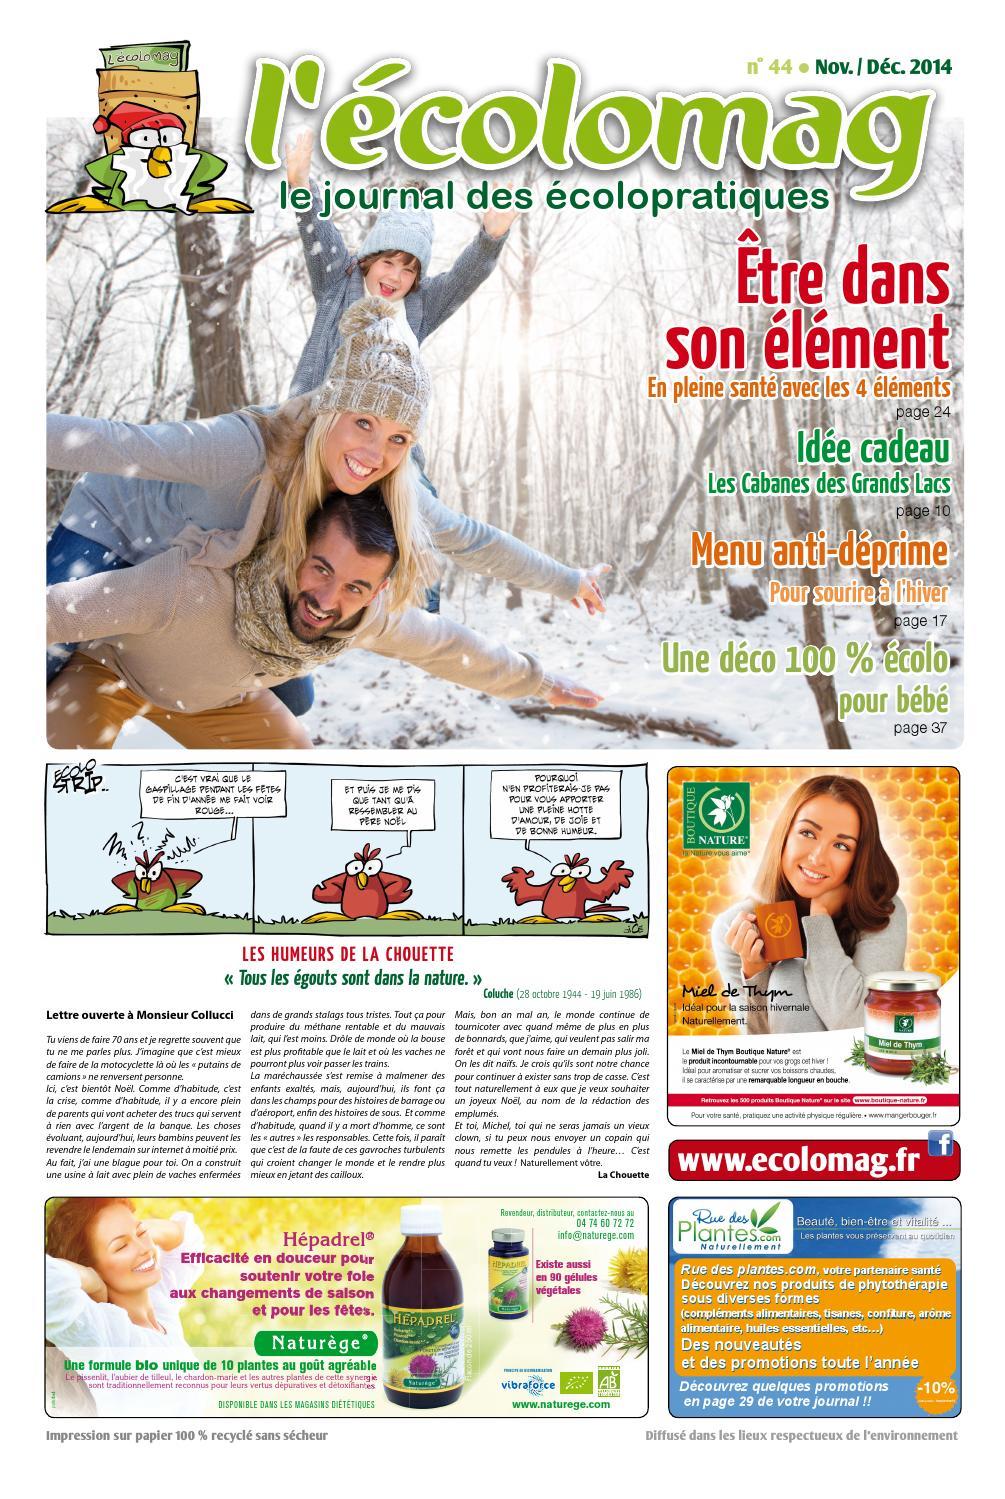 L Ecolomag n°44 by L Ecolomag - issuu fce7b0530253